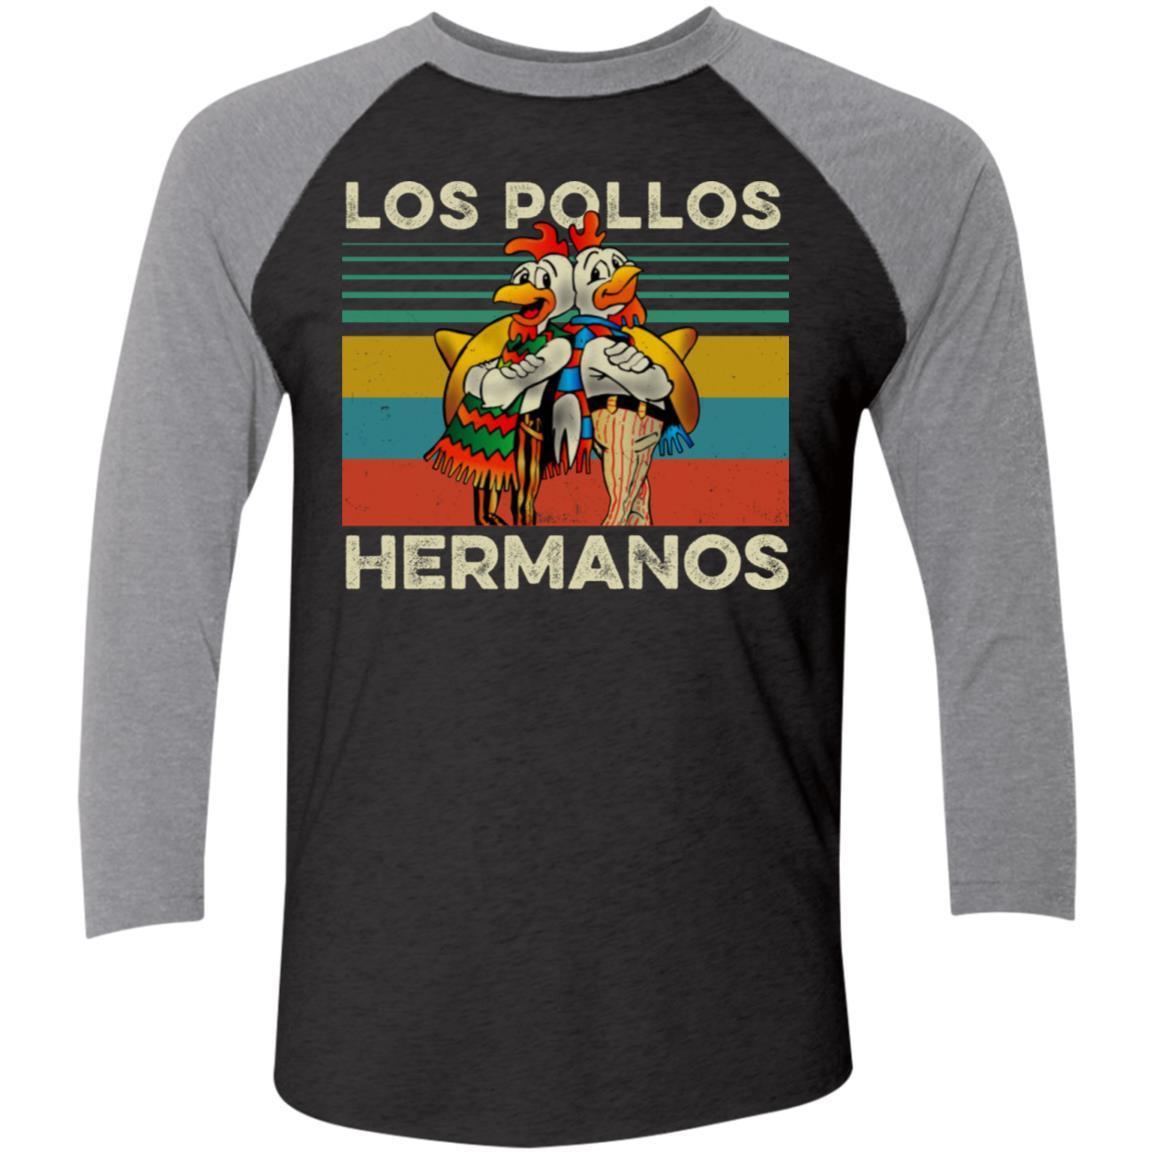 Los Pollos Hermanos T-shirt Better Call Saul Heather Gray shirts S-4XL sizes